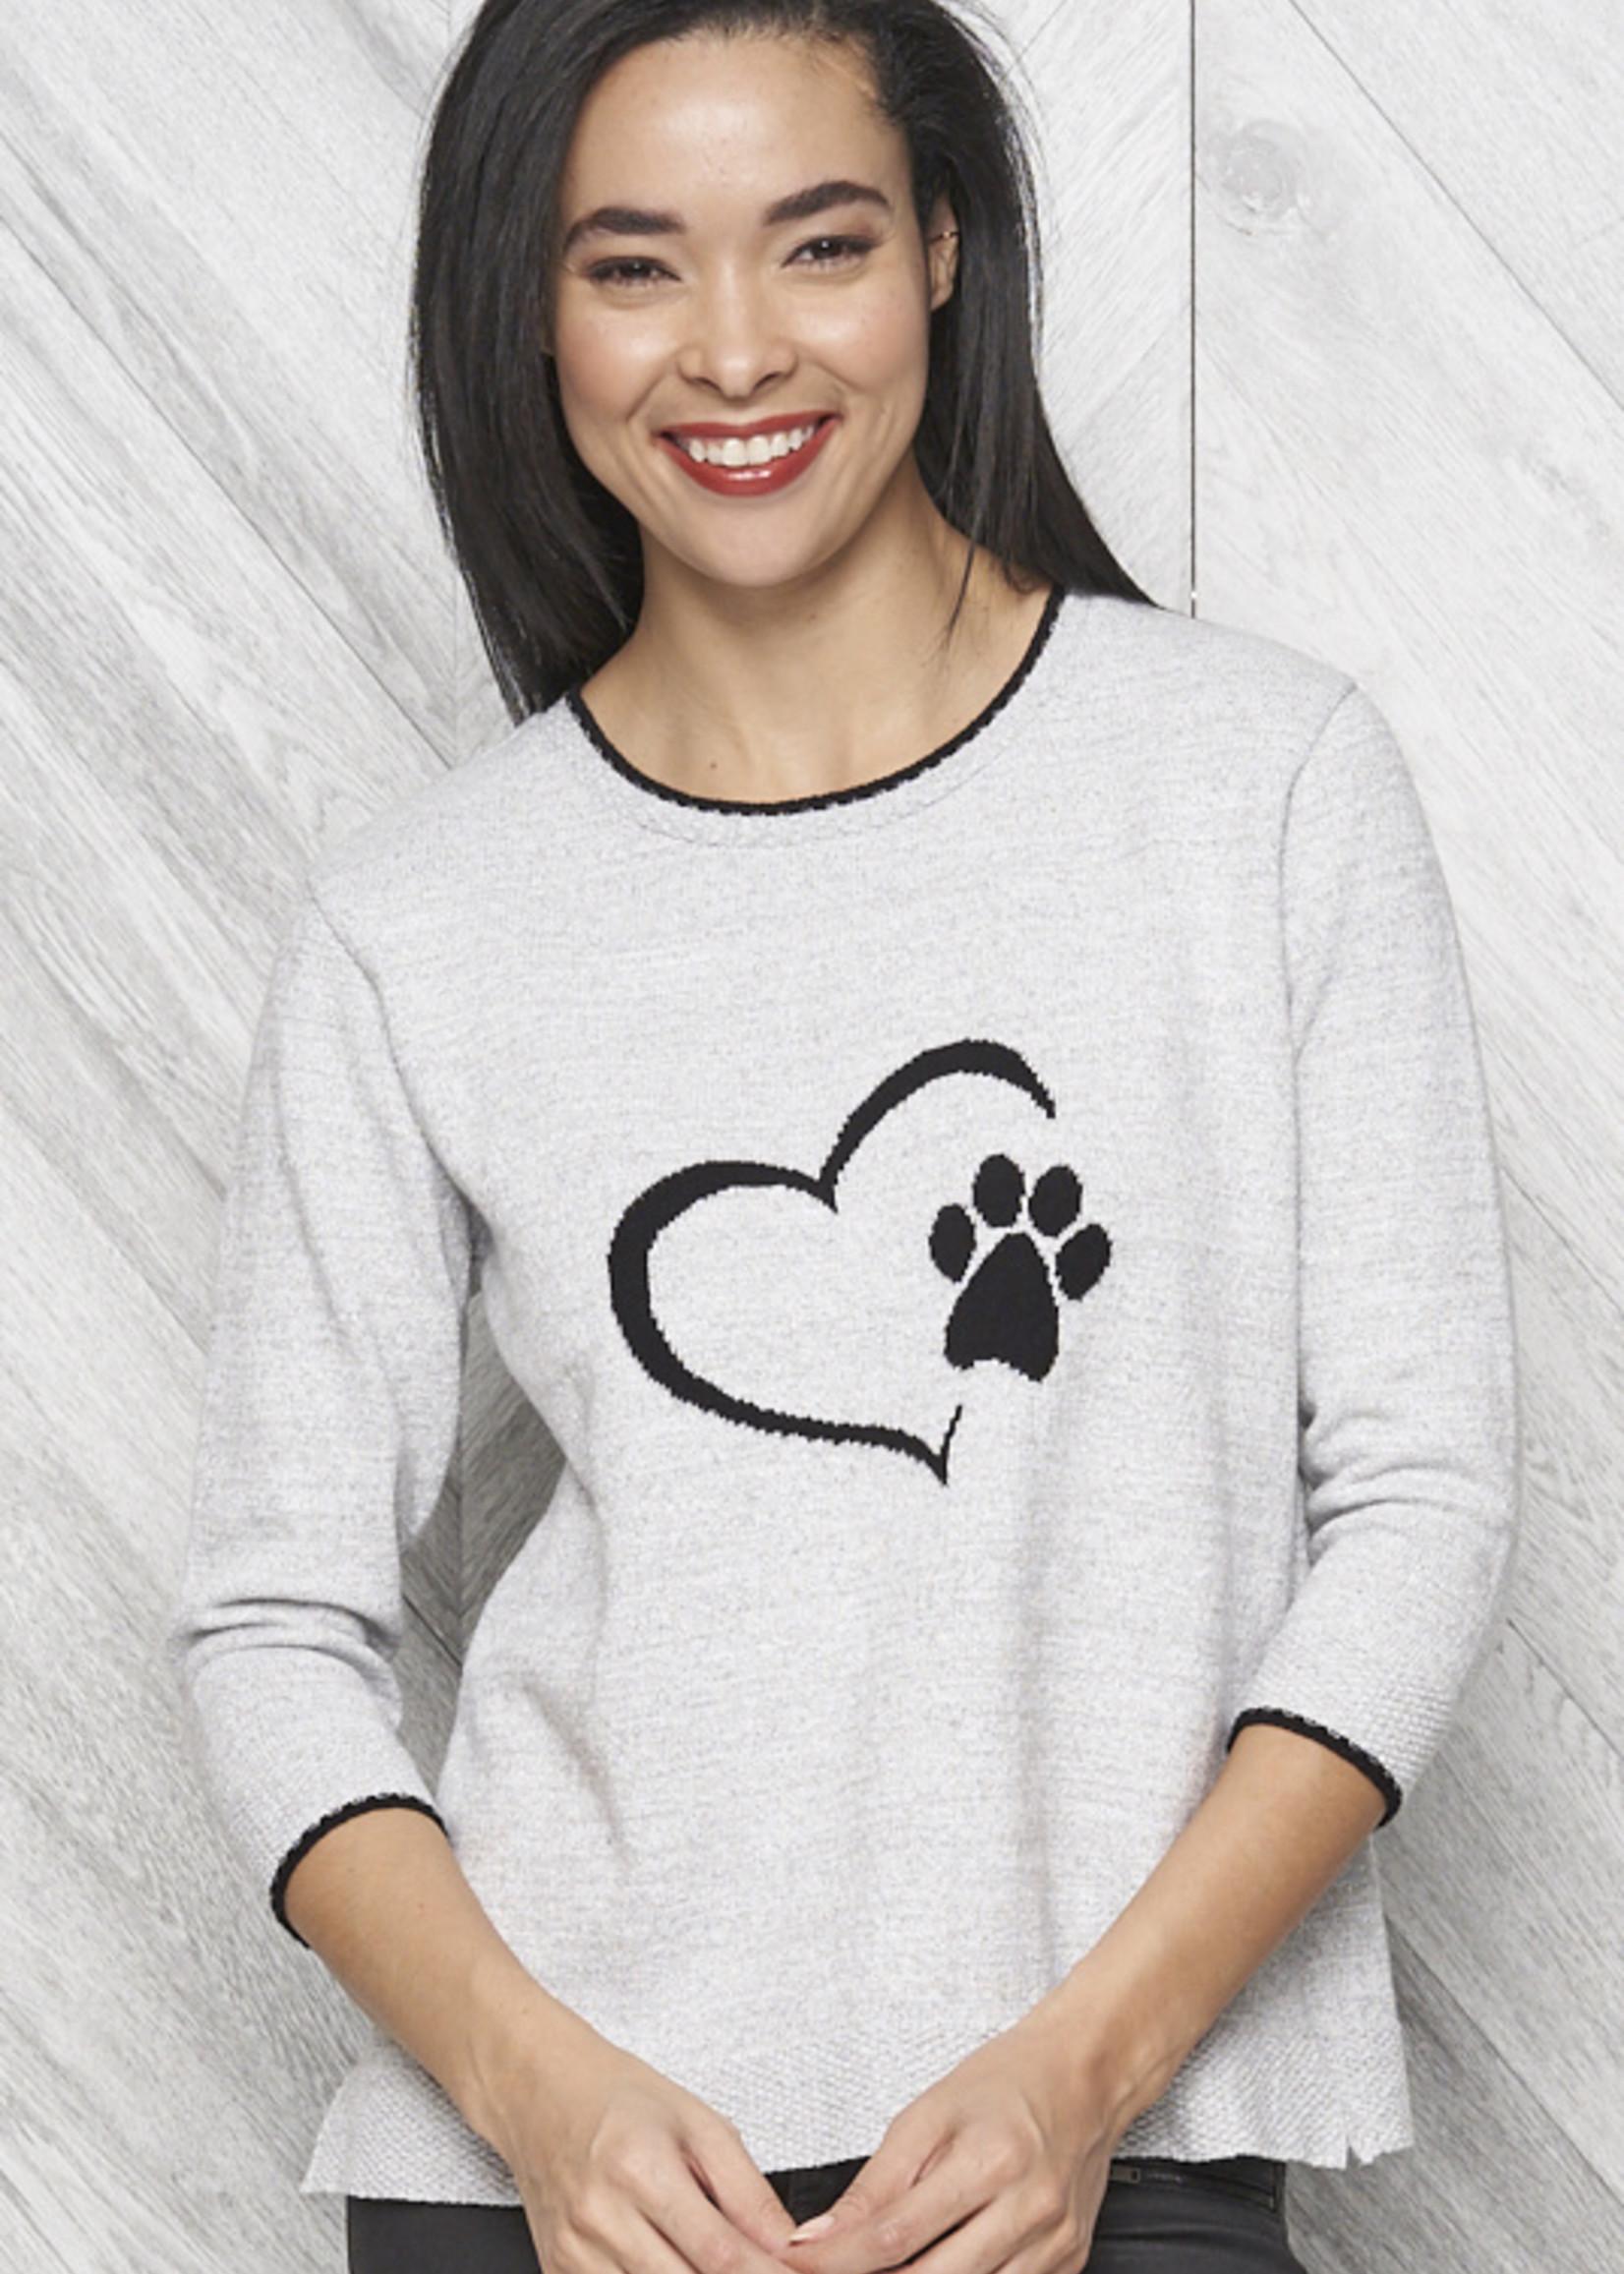 Parkhurst Parkhurst I Love My Pet Cotton Pullover